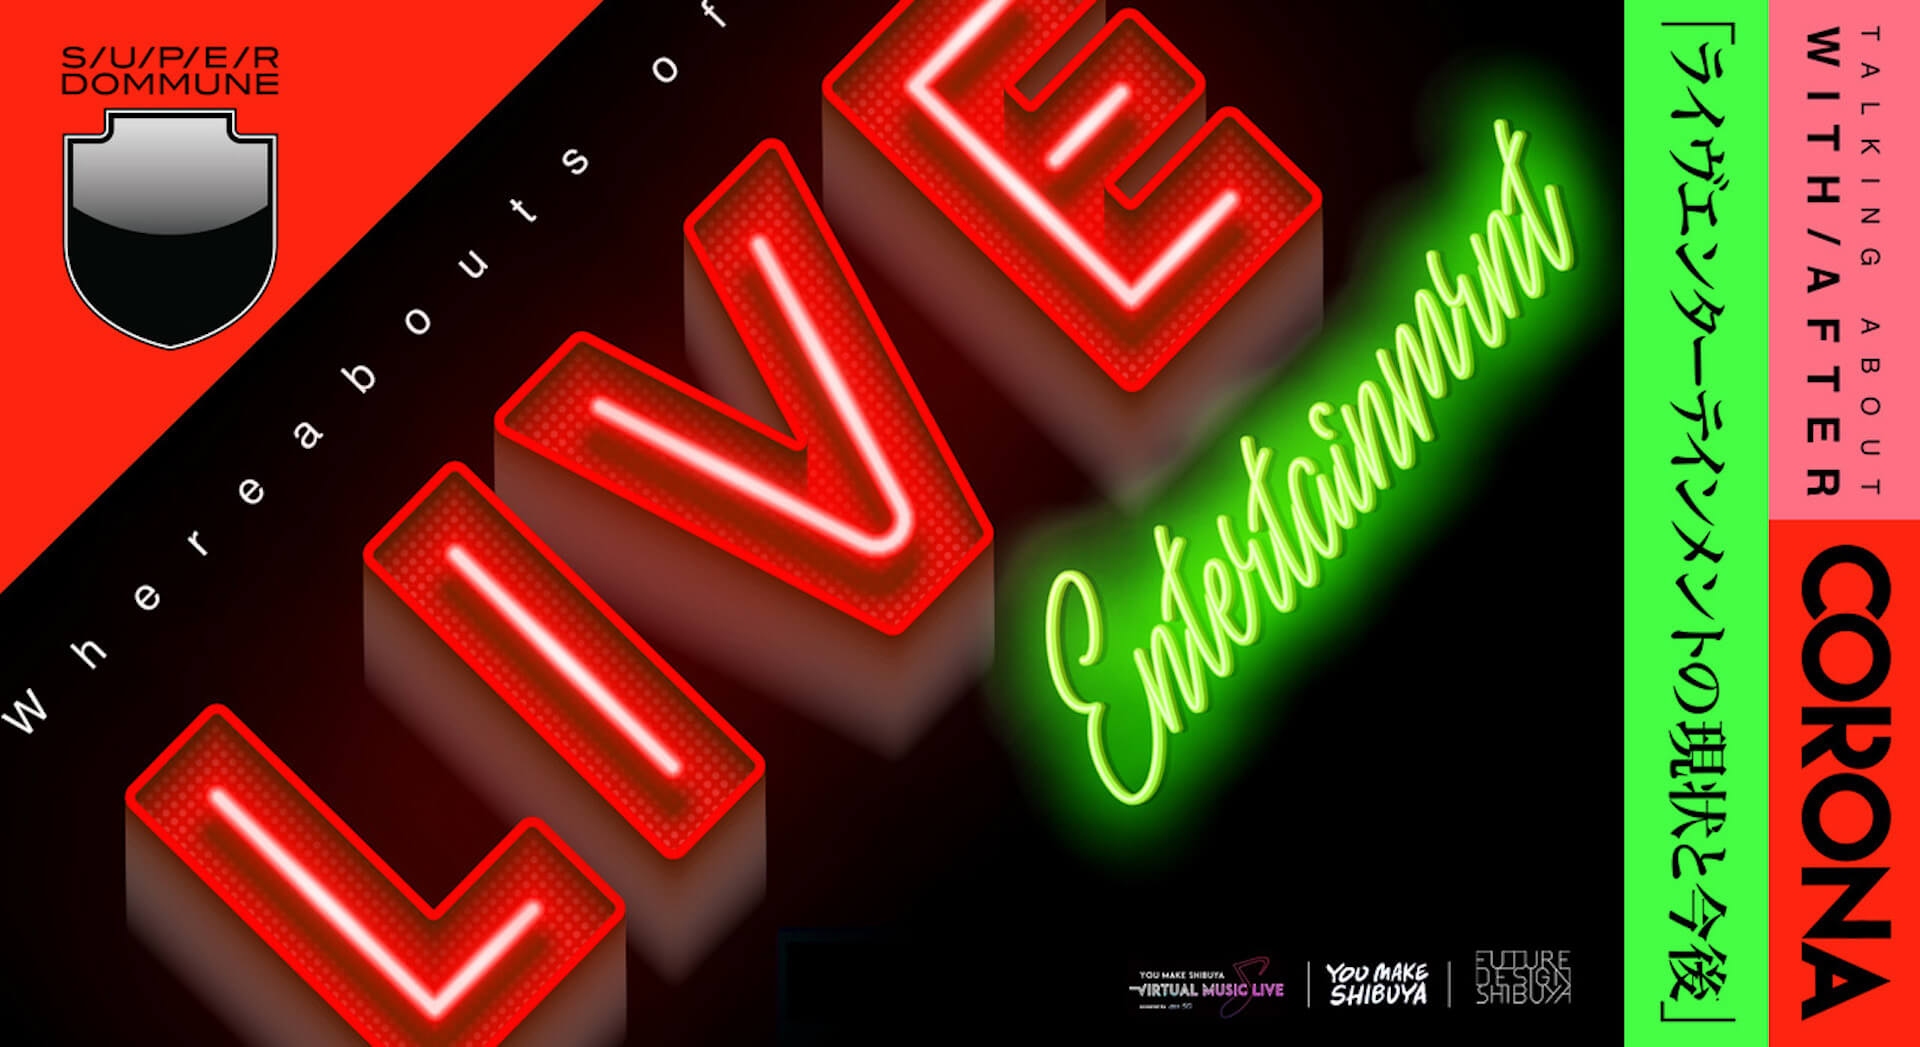 SUPER DOMMUNEでポストコロナを語る生番組『ライヴエンターテインメントの現状と今後』が配信決定 music210413_dommune_live_1